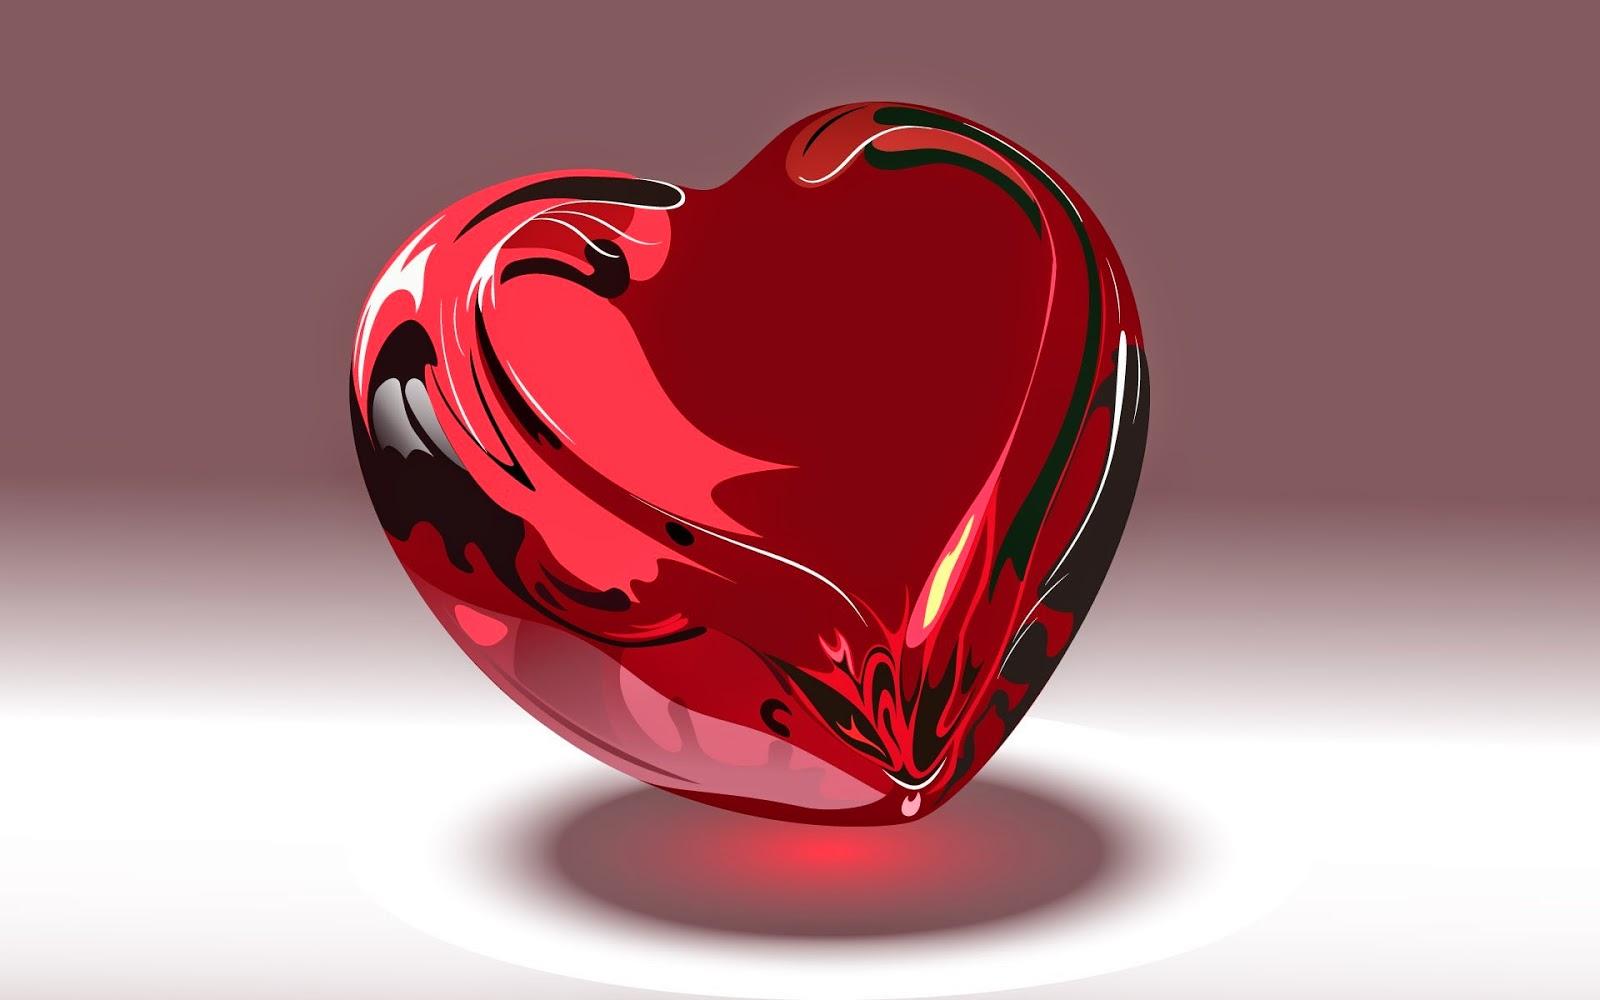 Gambar Cinta Red Heart Permen Rasa Cinta